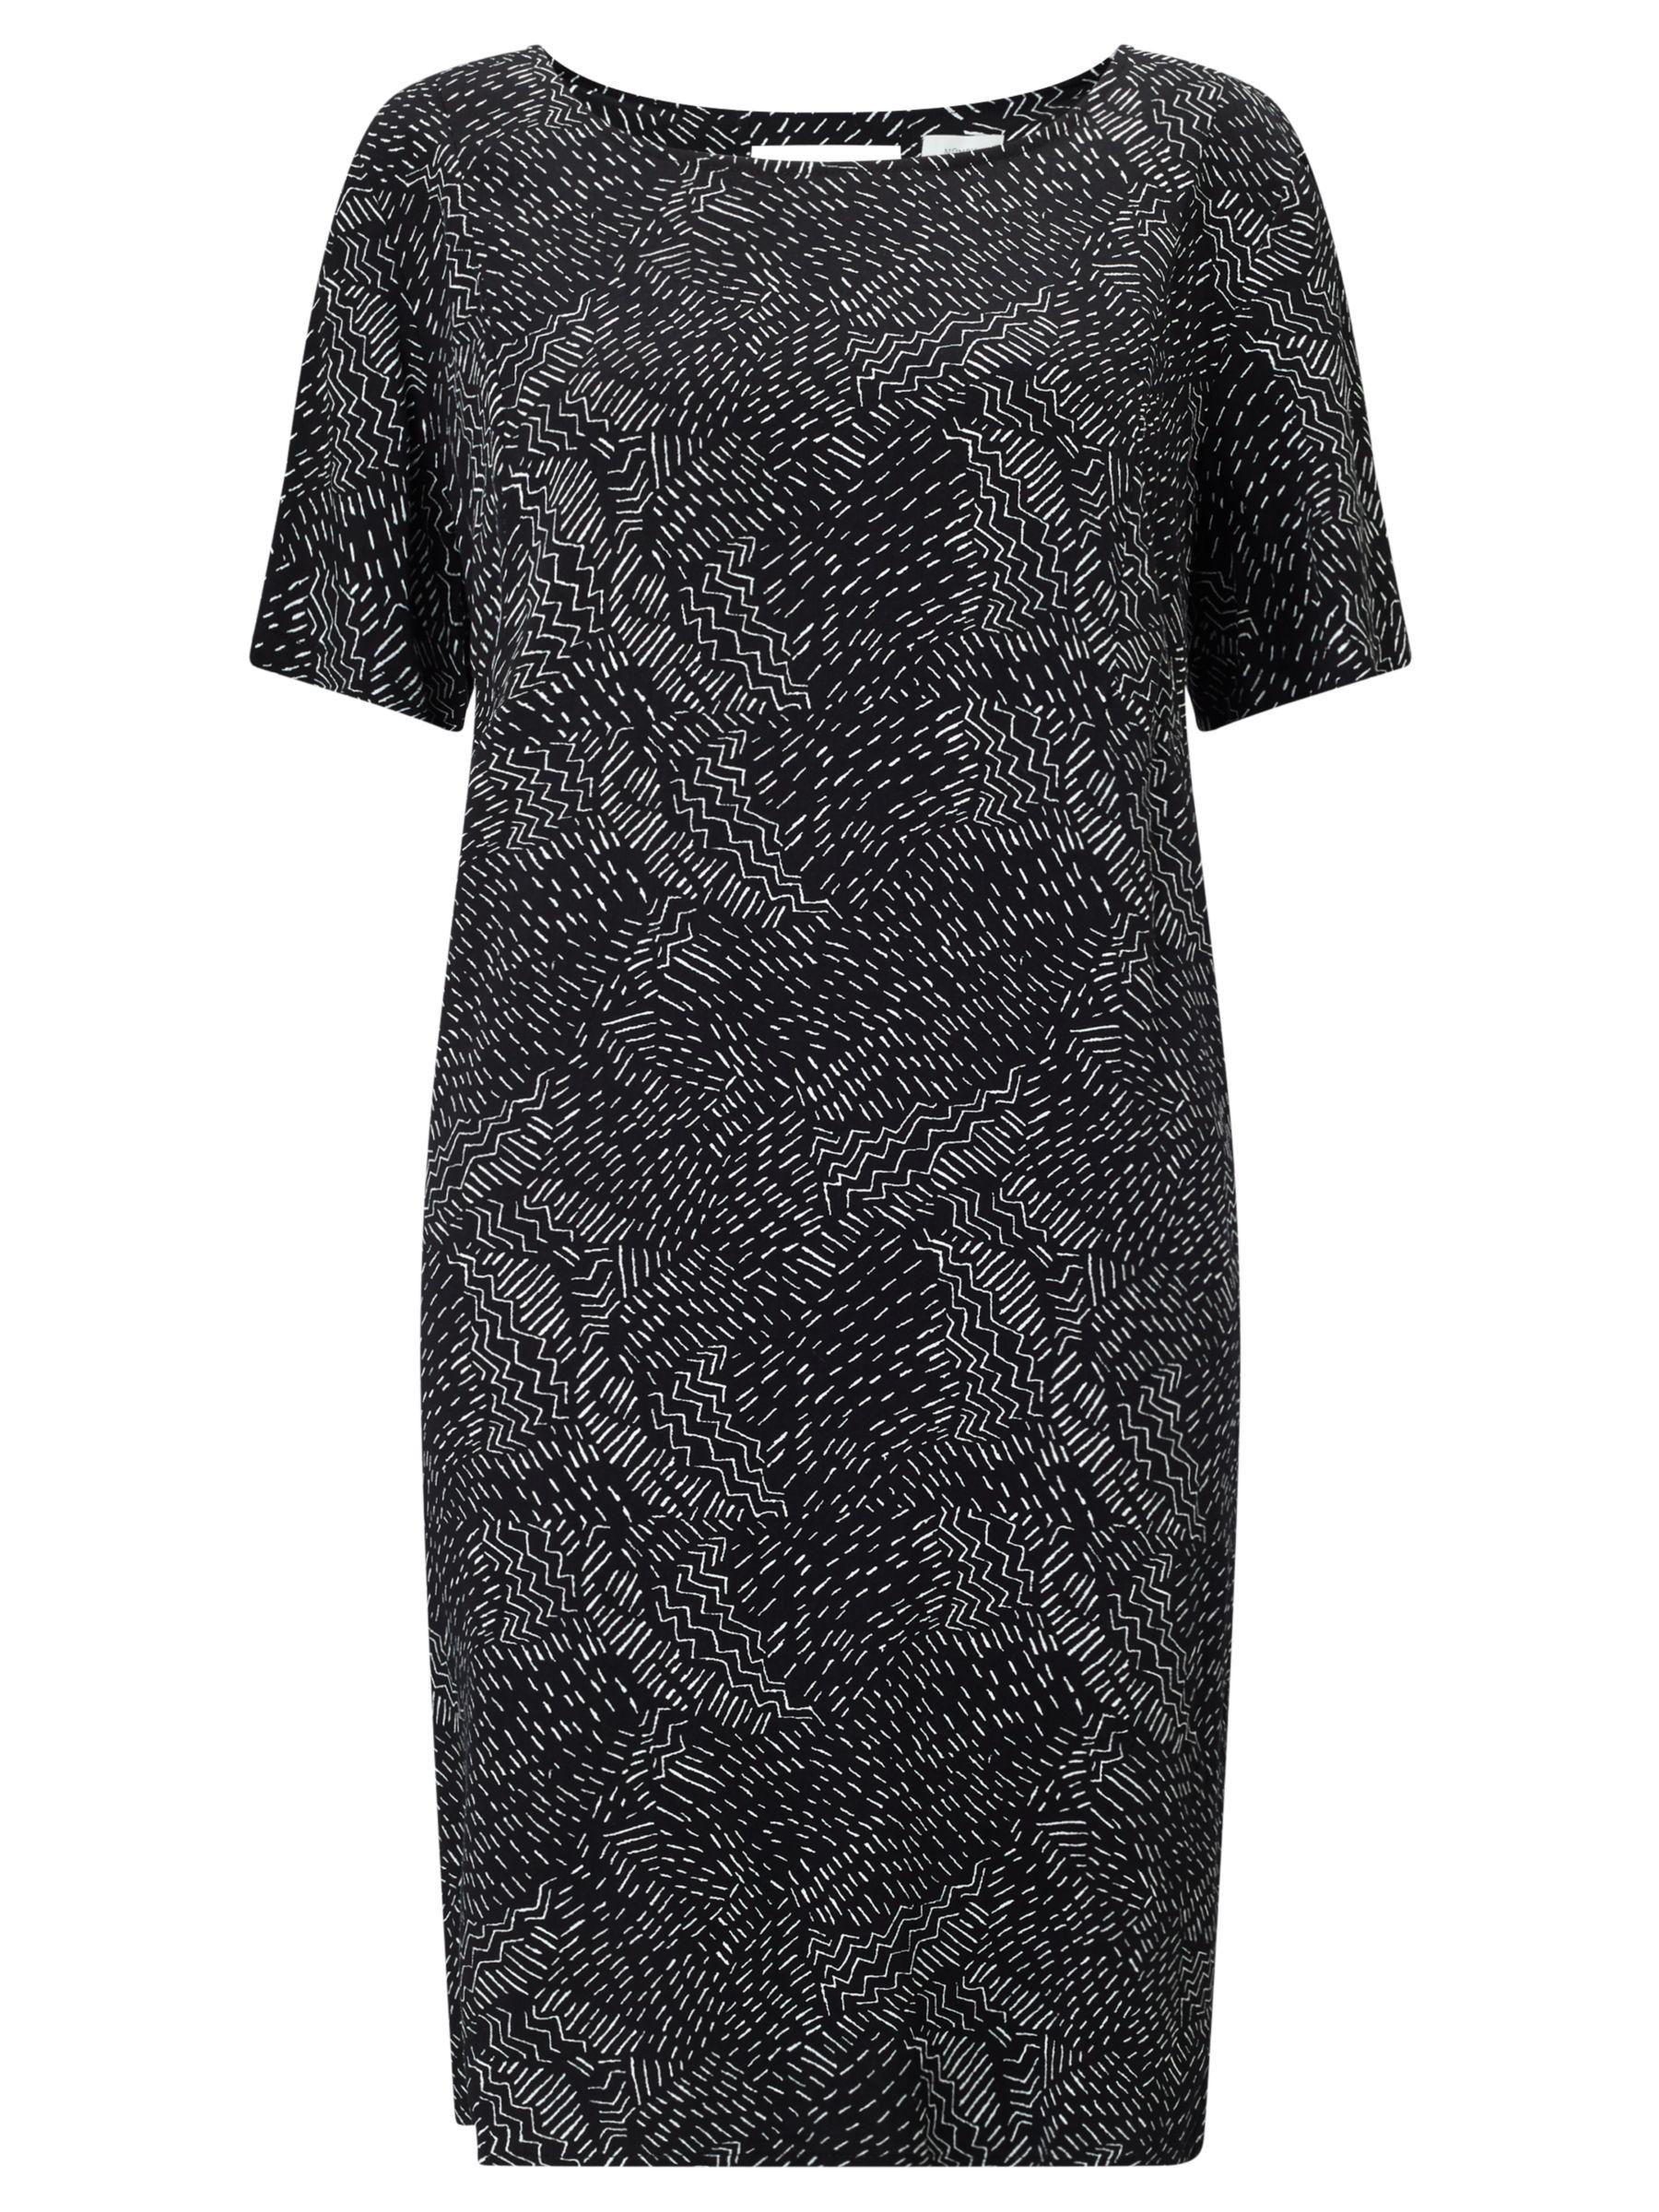 Numph Numph Jenetta Printed Dress, Caviar